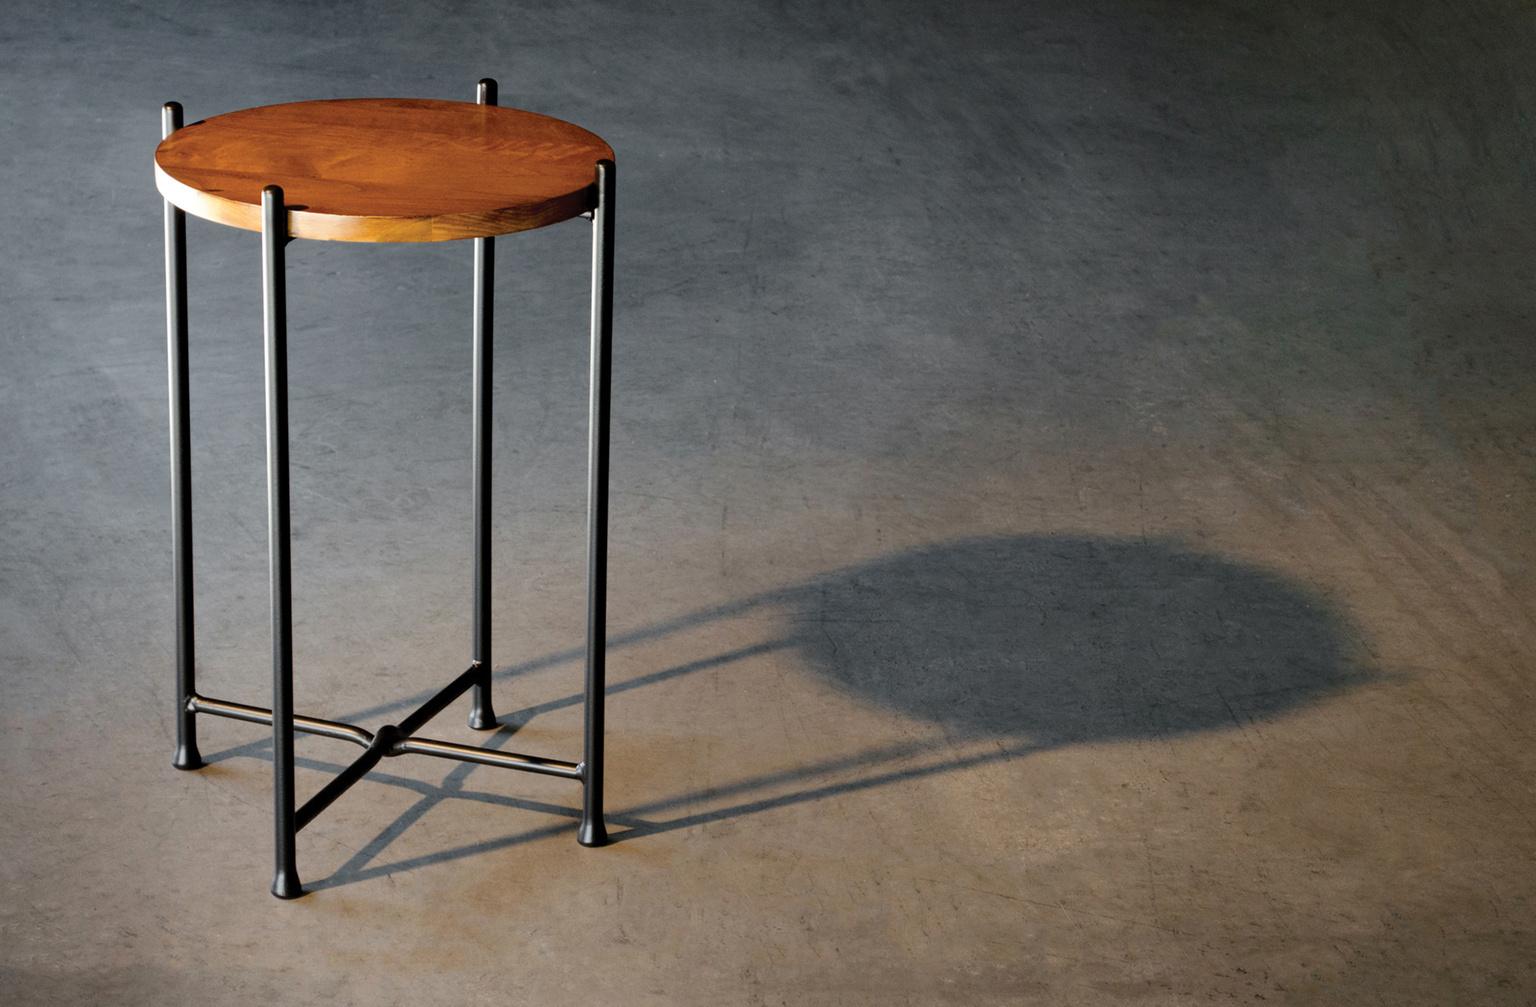 Charleston Forge Wood And Steel Furniture